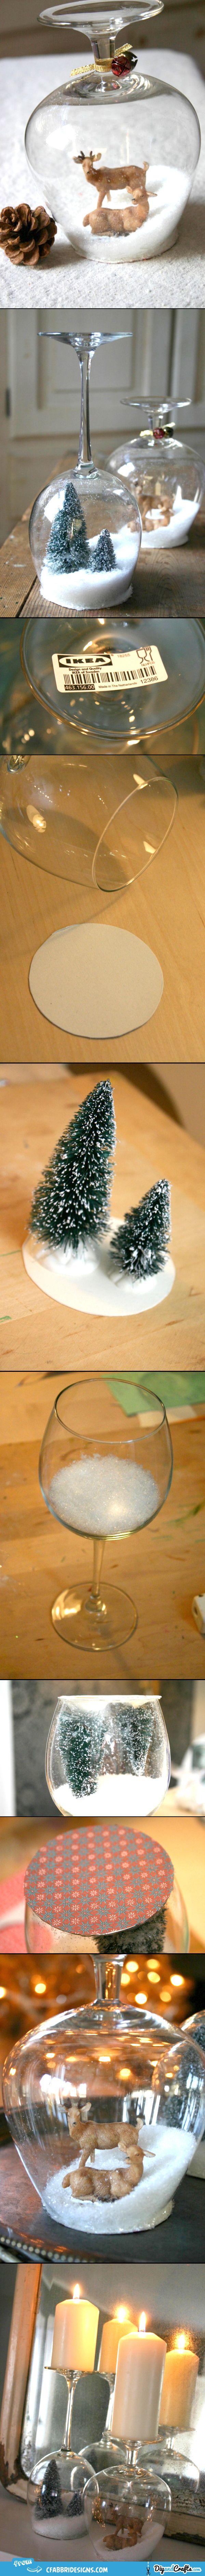 Stemware Snow Globes DIY